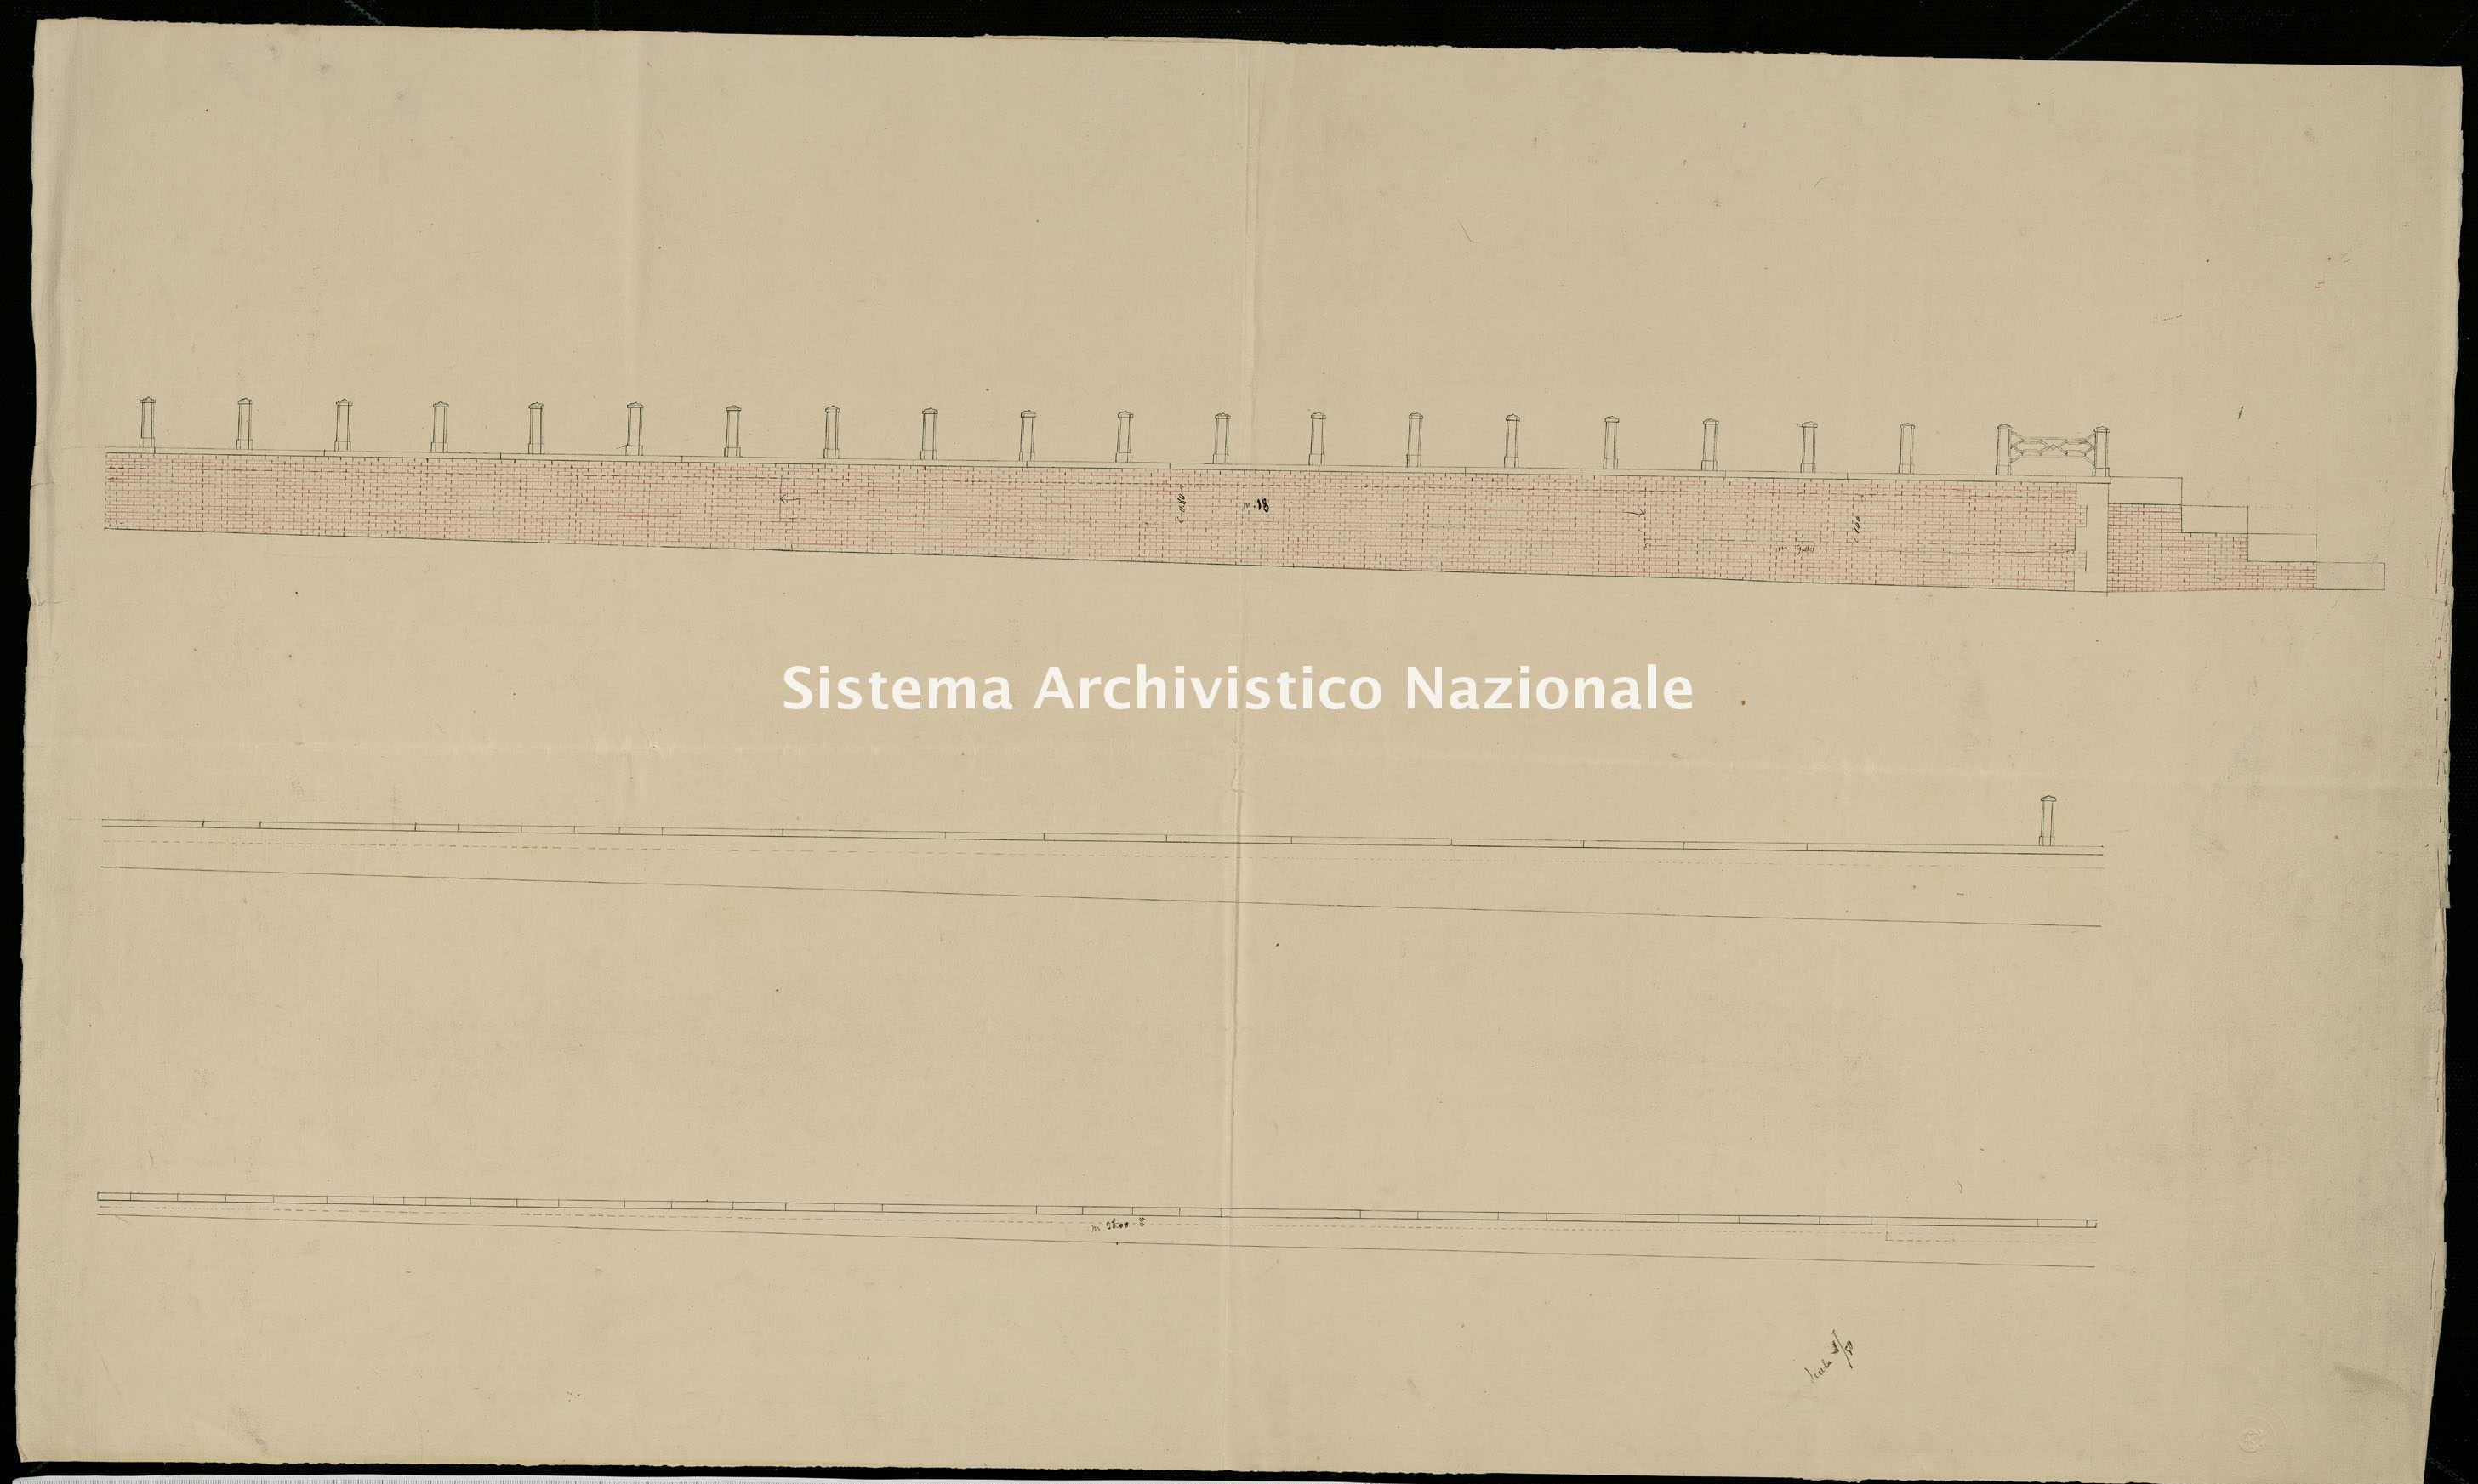 ASPC Mappe, stampe e disegni, n. 5110